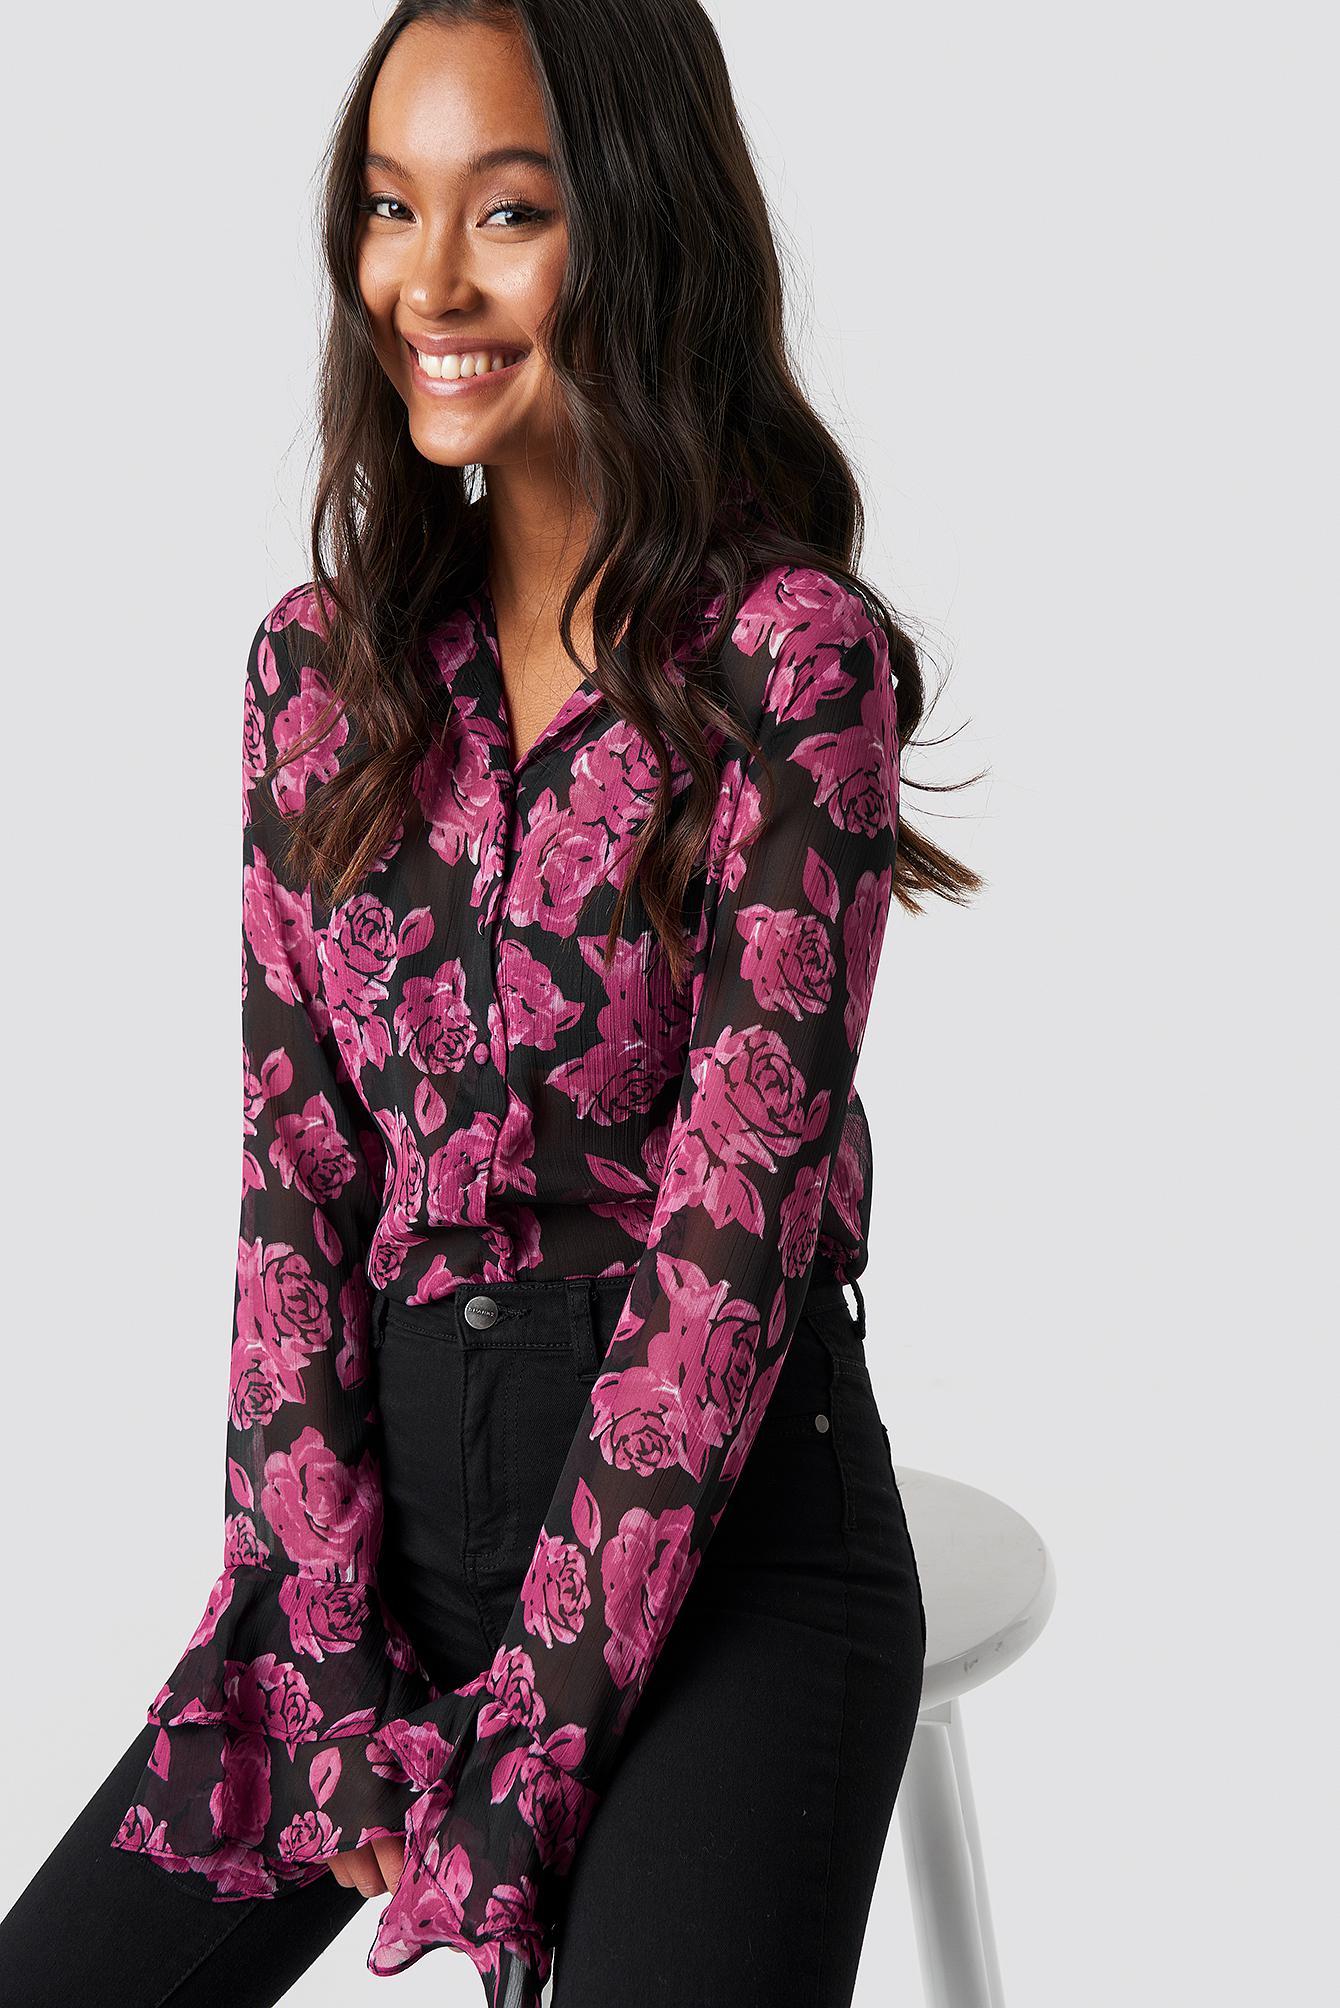 068a016ff5a NA-KD. Women's Chiffon Frill Sleeve Shirt Burgundy Roses